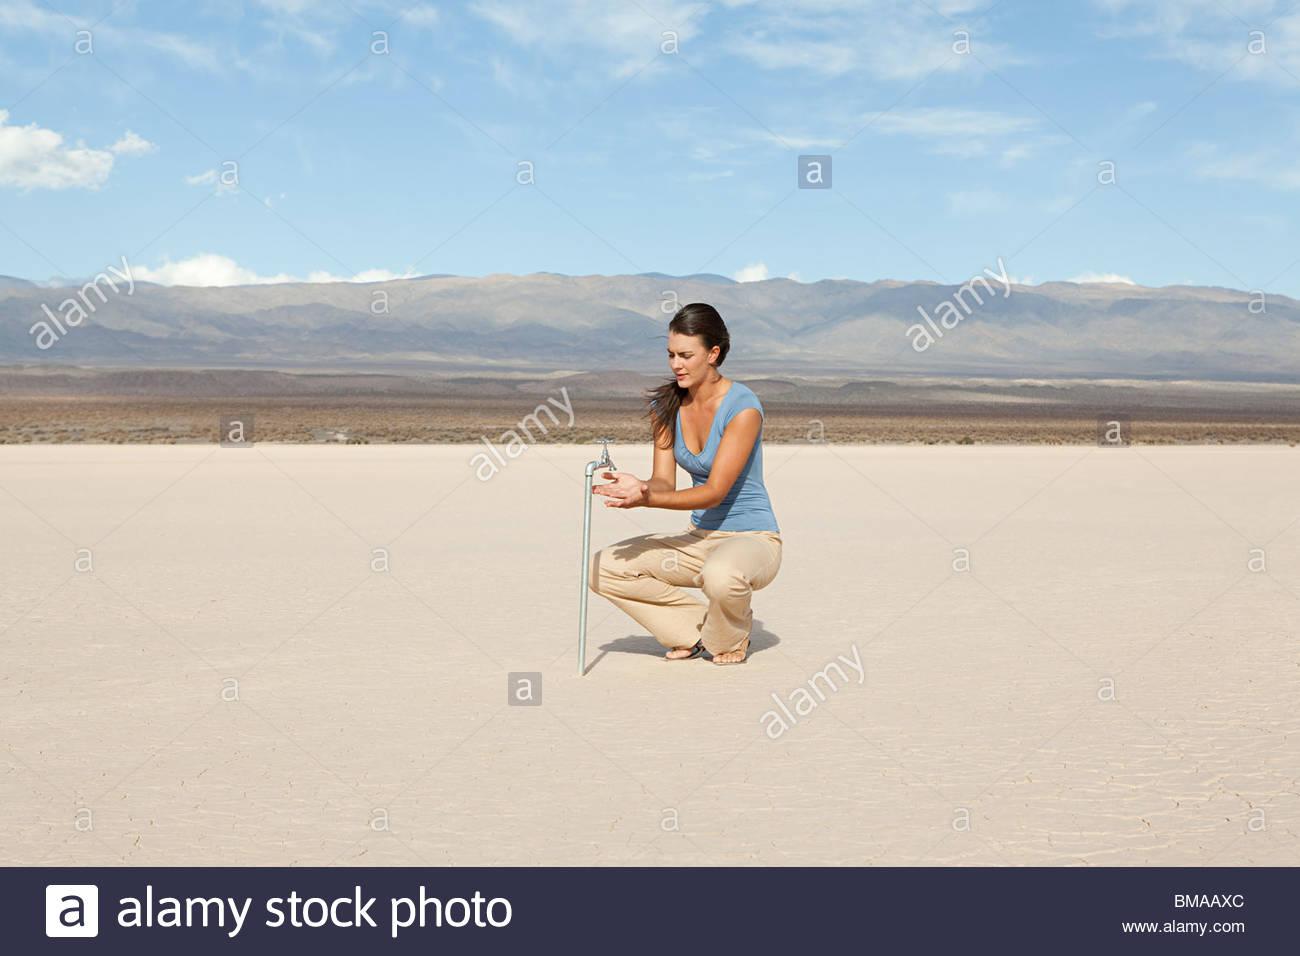 Woman using faucet in desert landscape - Stock Image